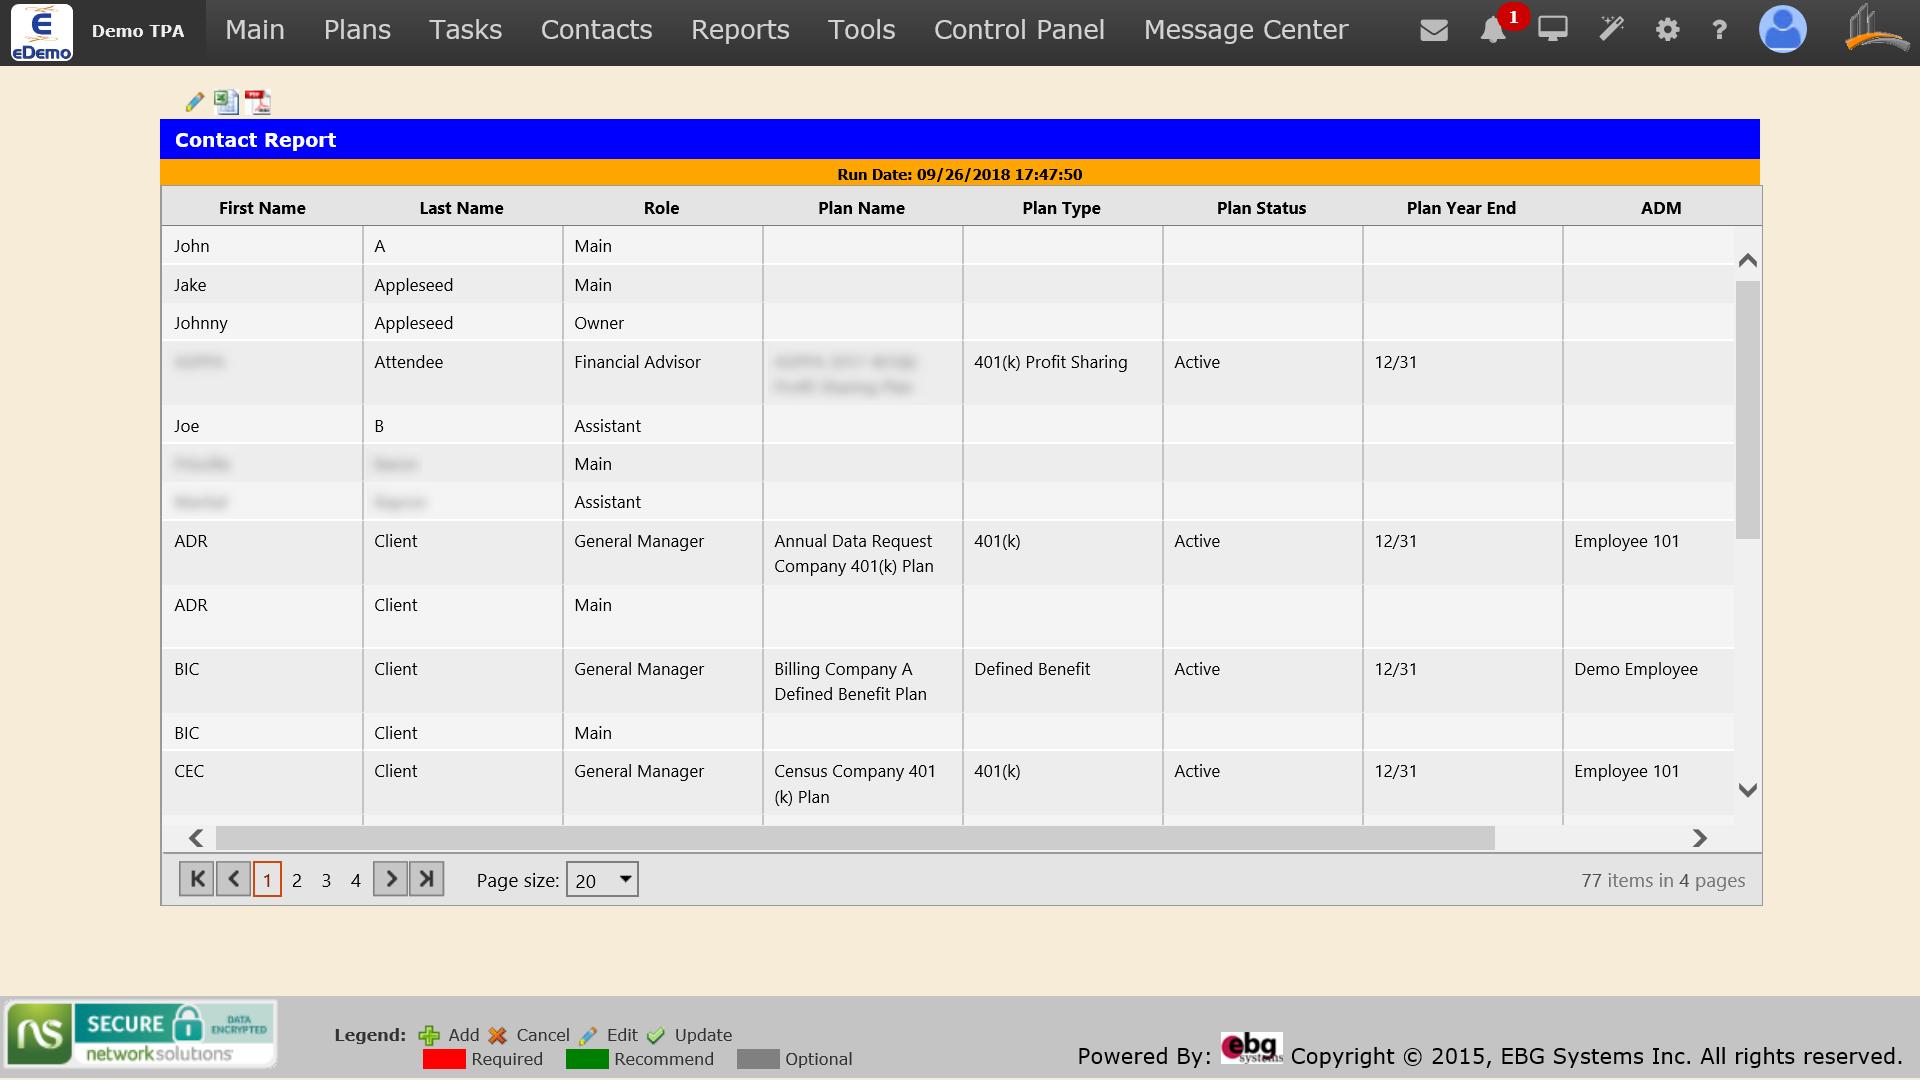 screenshot of Contact Report.jpg